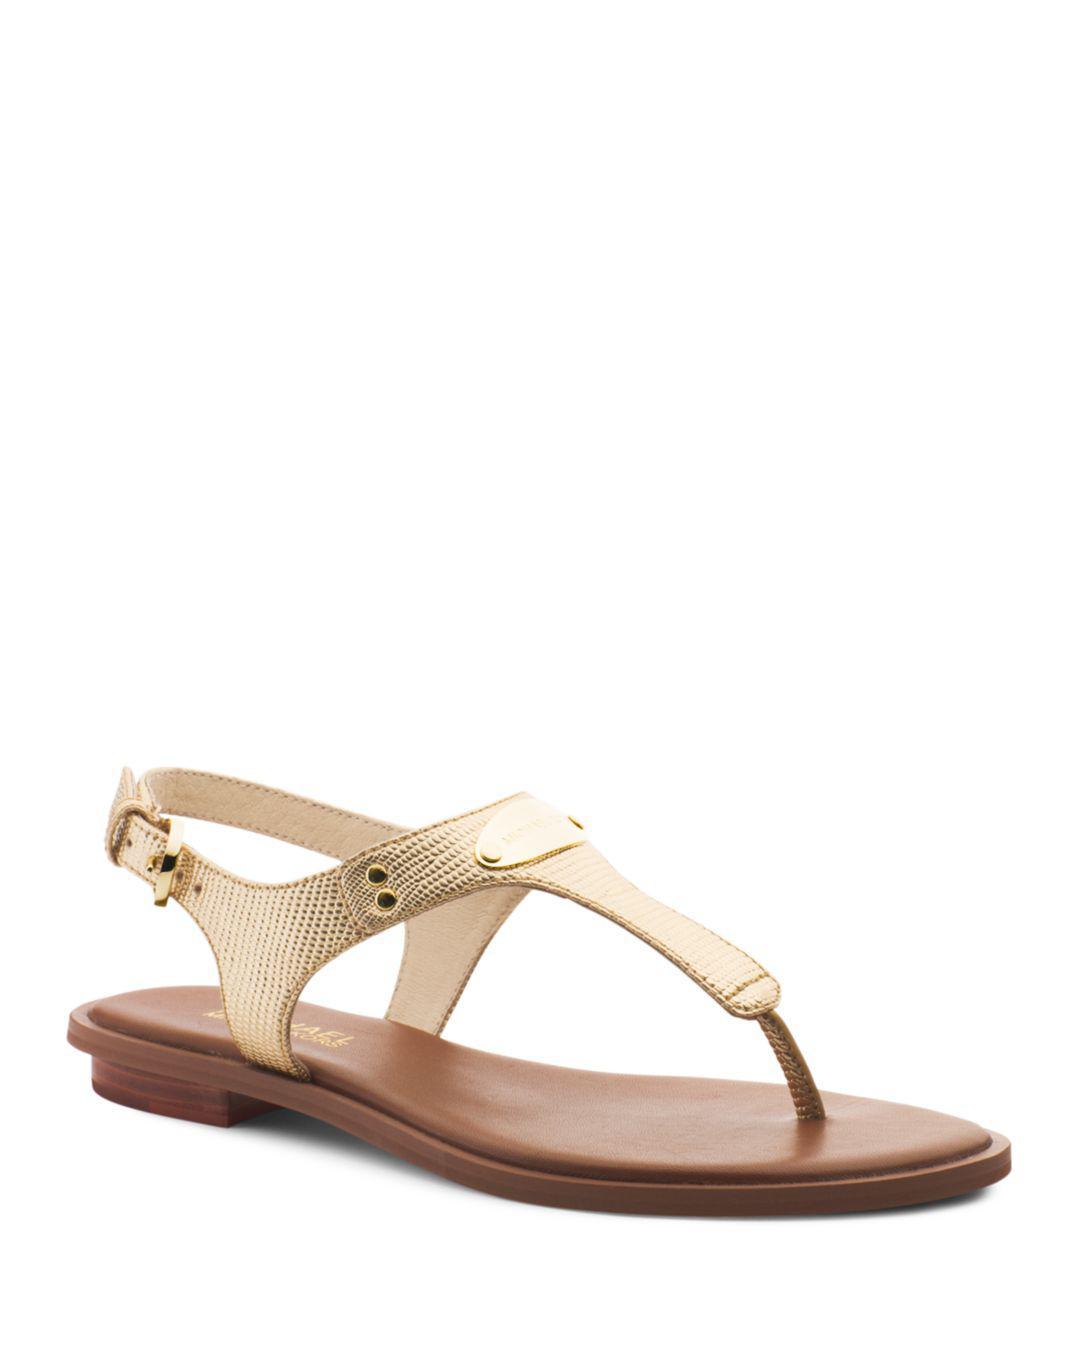 eeb4897aee3 MICHAEL Michael Kors. Women s Mk Plate Thong Sandals